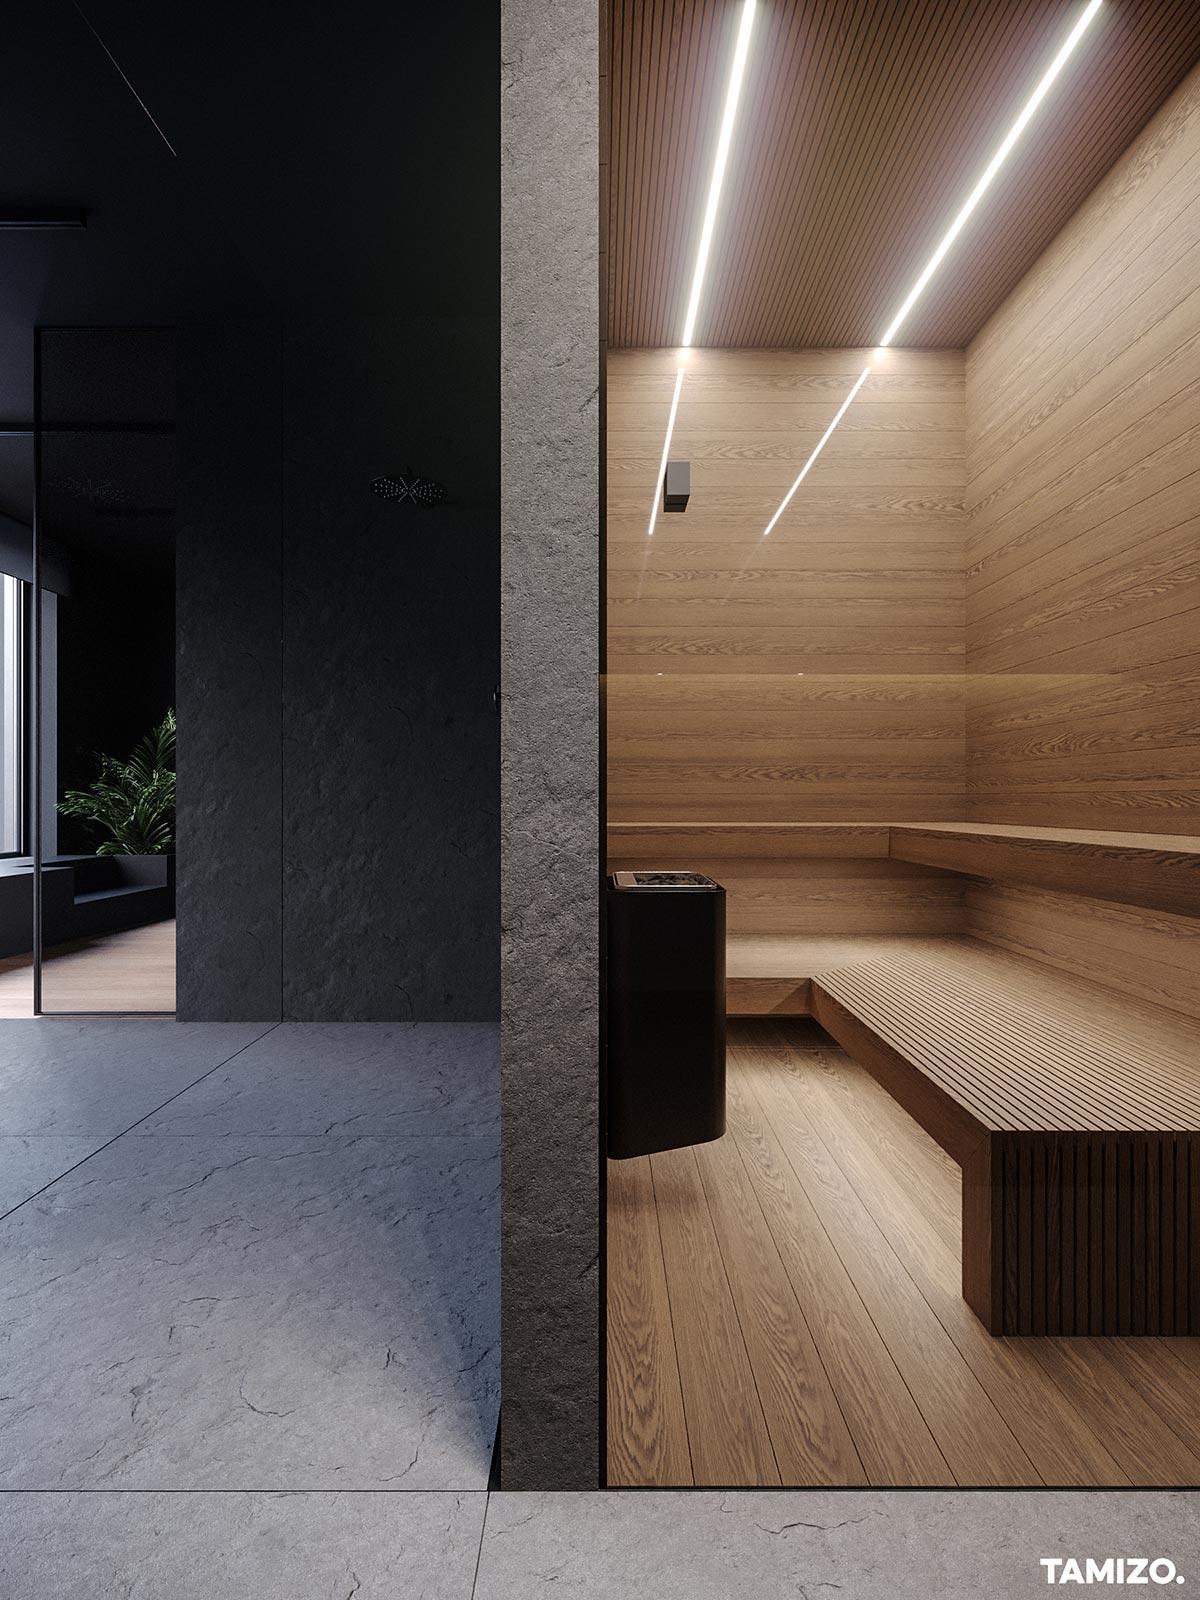 tamizo_architects_house_interior_desgn_projekt_wnetrz_minimal_ciemne_wnetrze_17